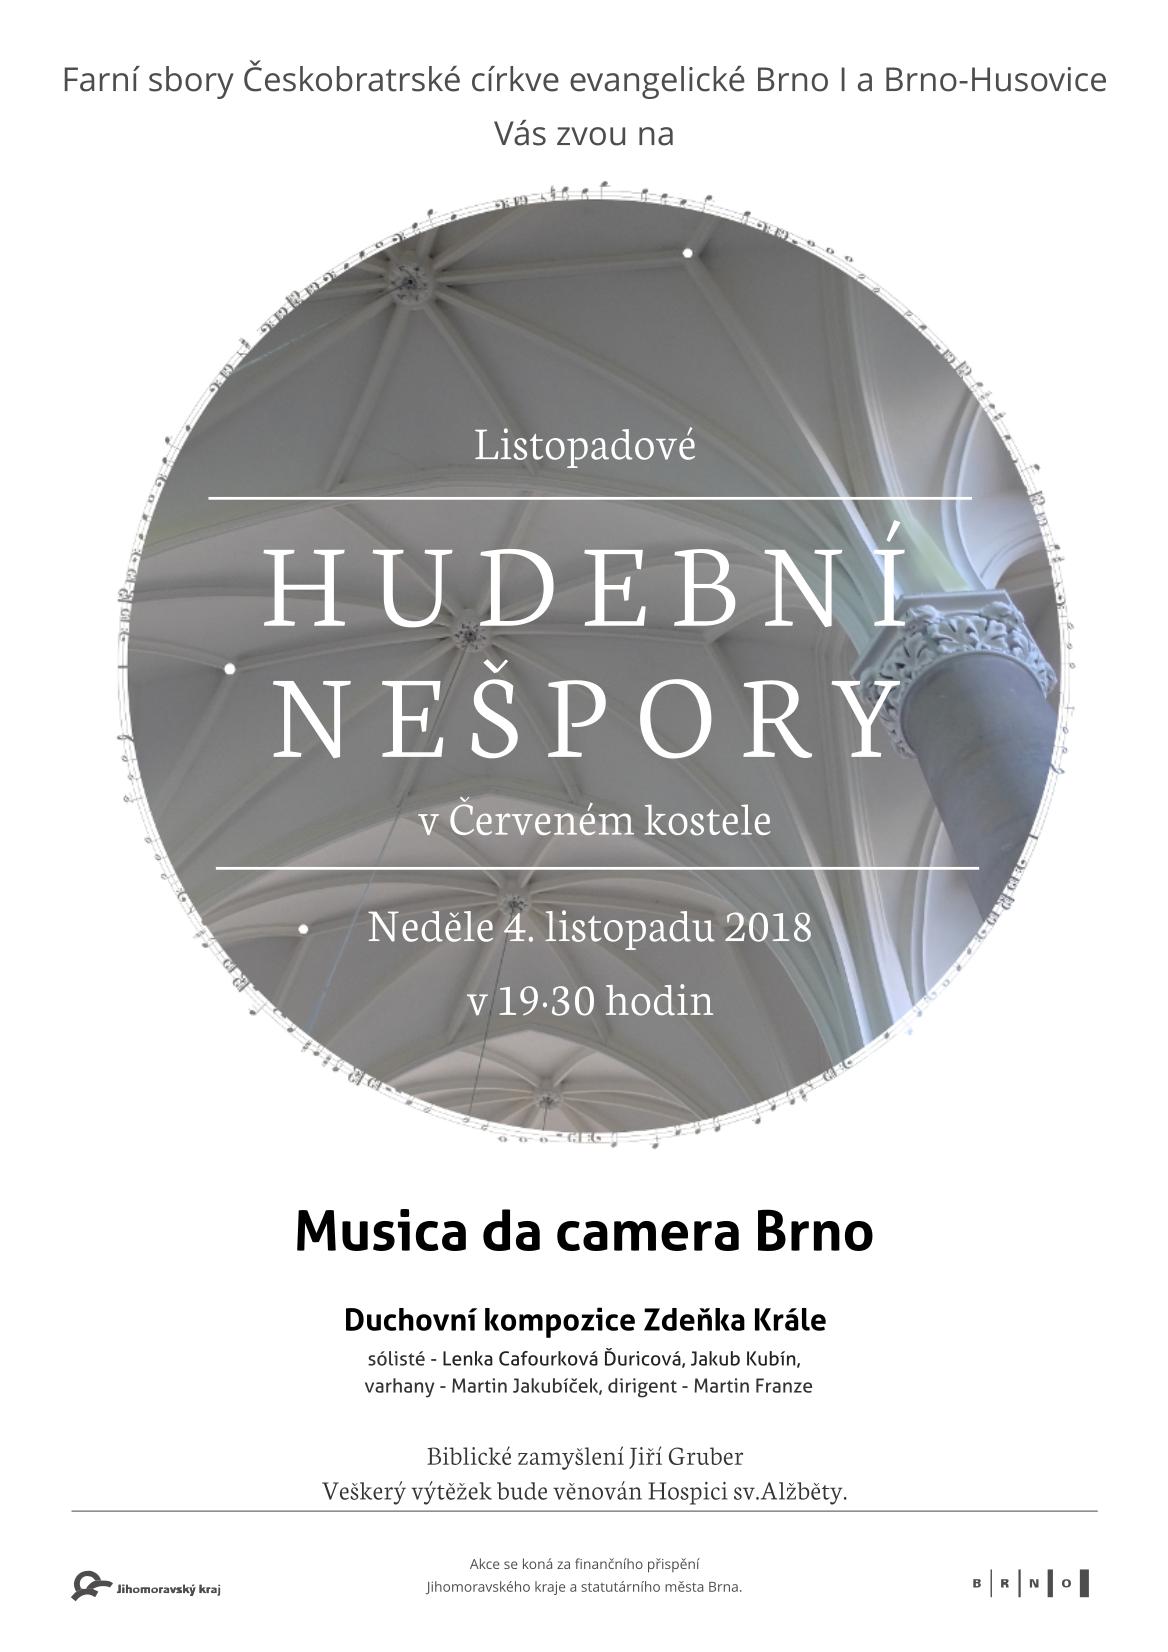 MdcB | Martin Franze | Koncert | Brno | 4.11.2018